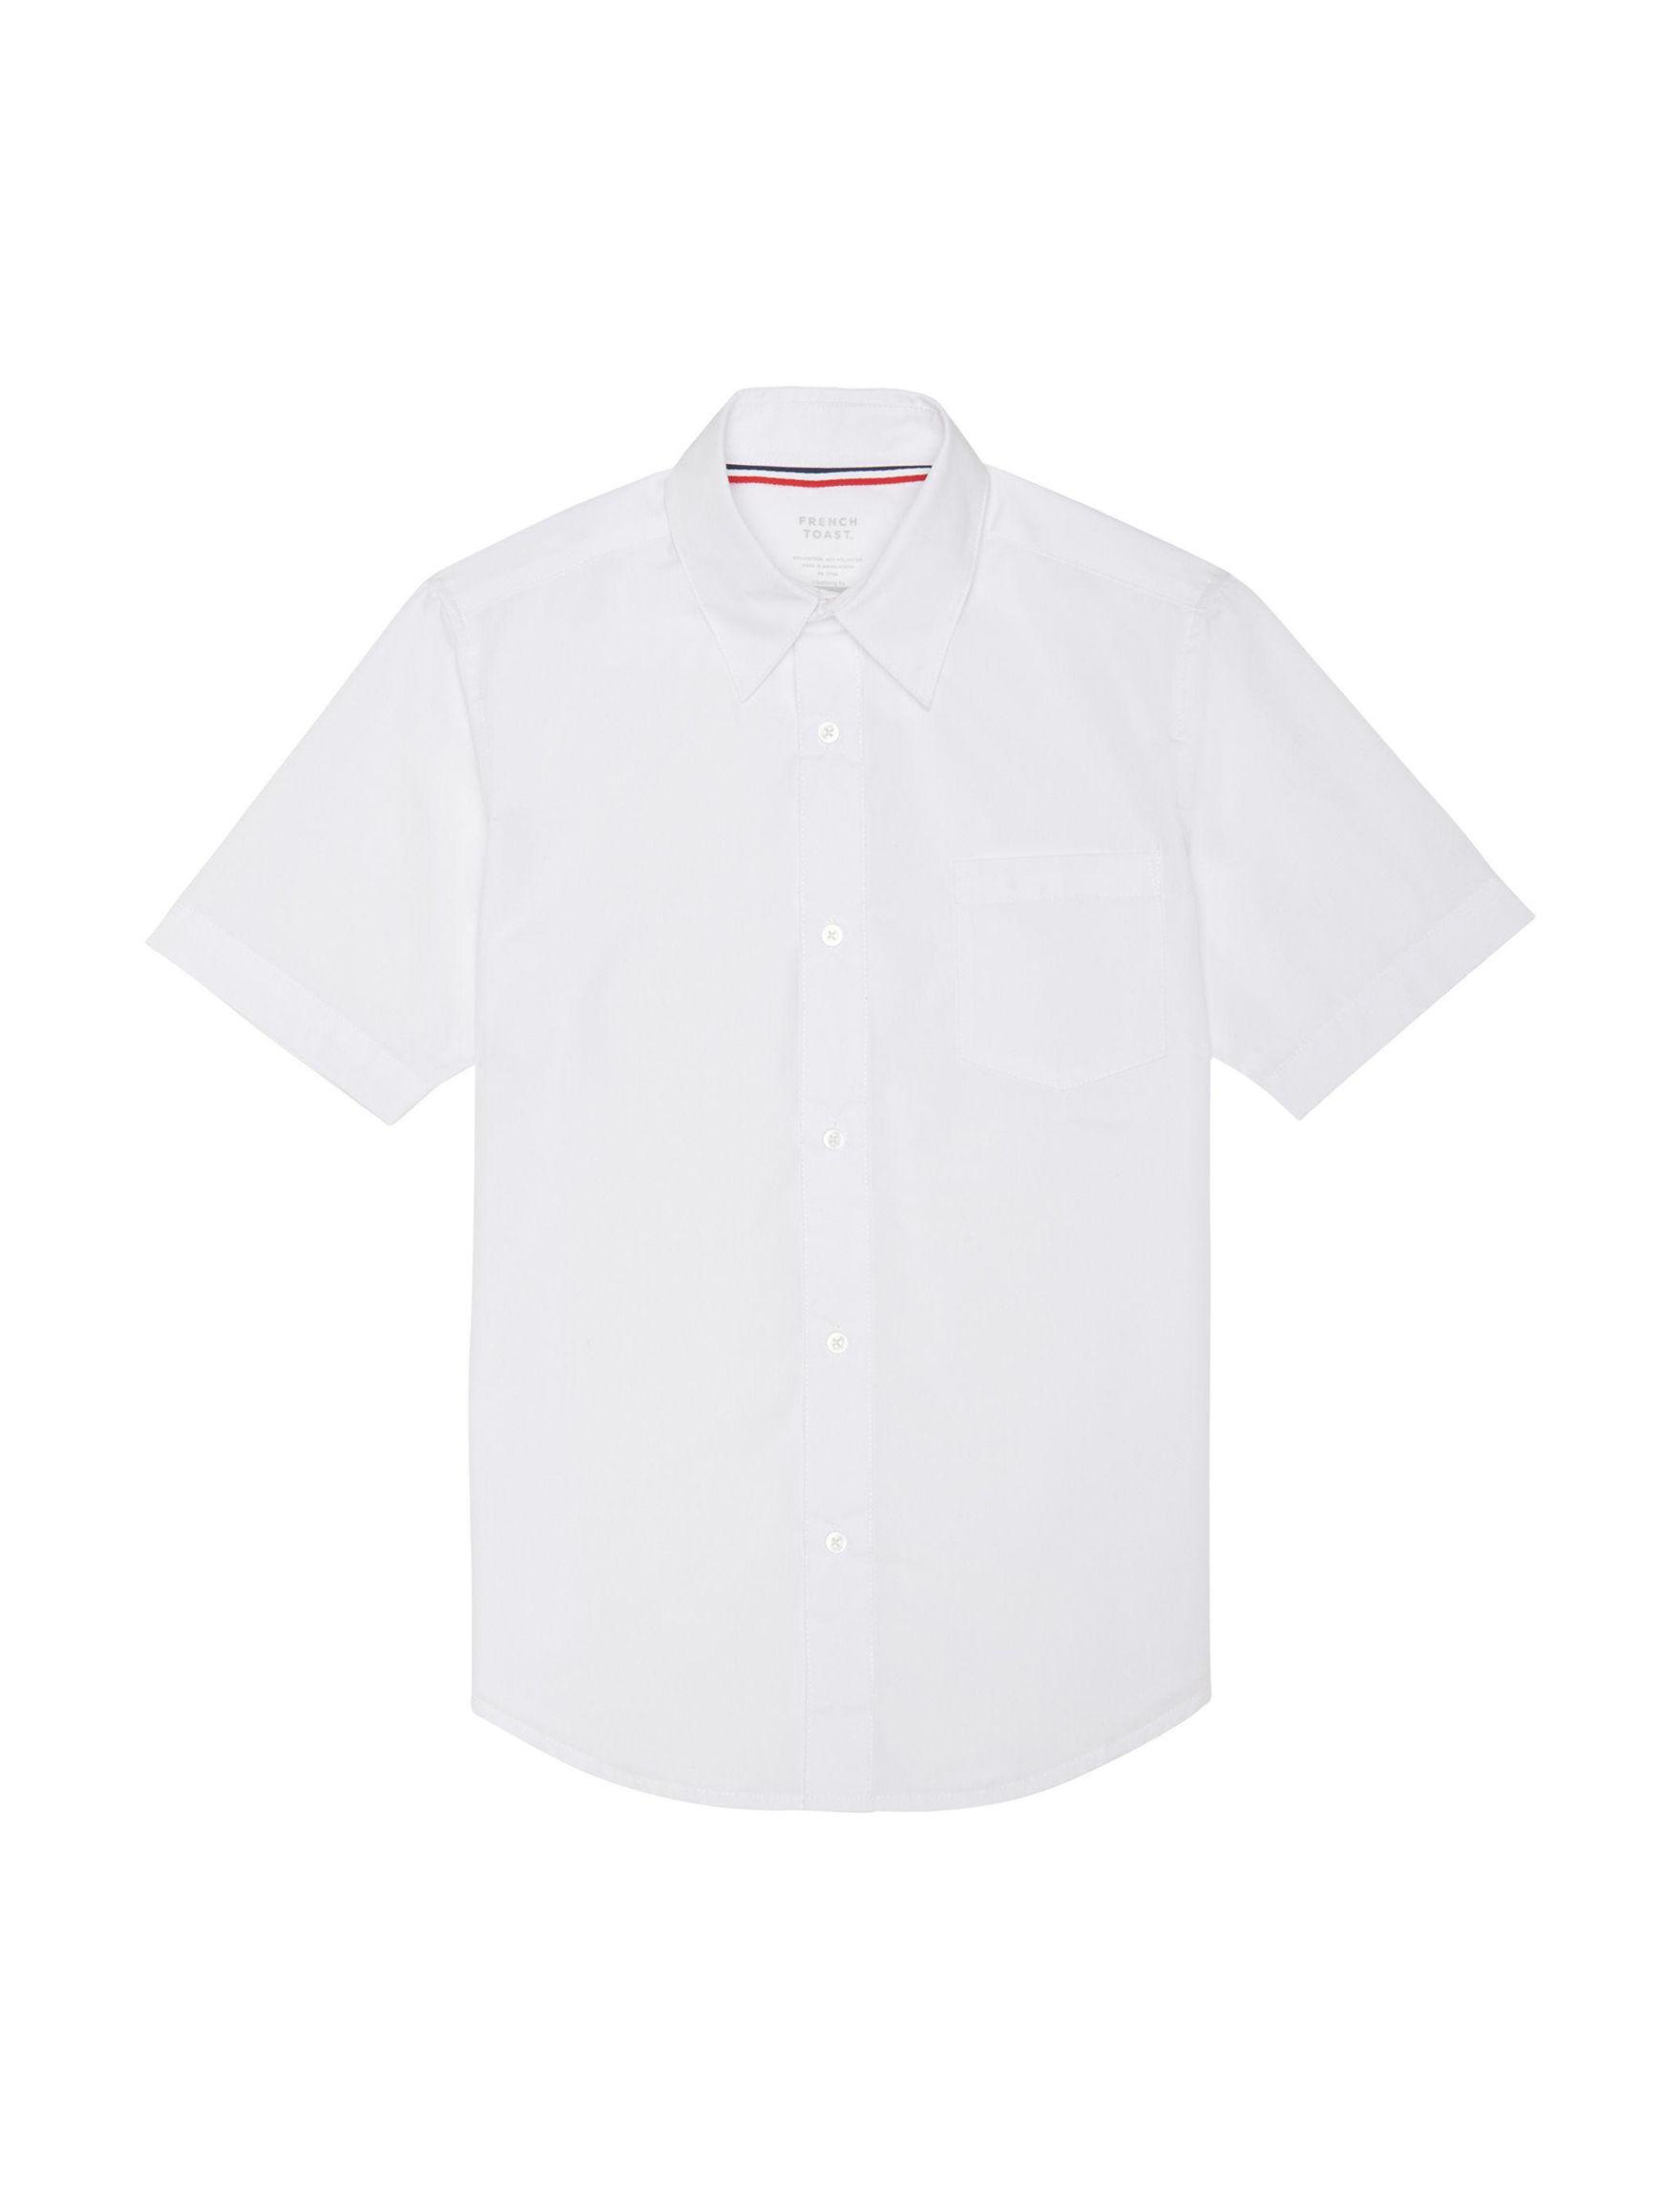 French Toast White Shirts & Blouses